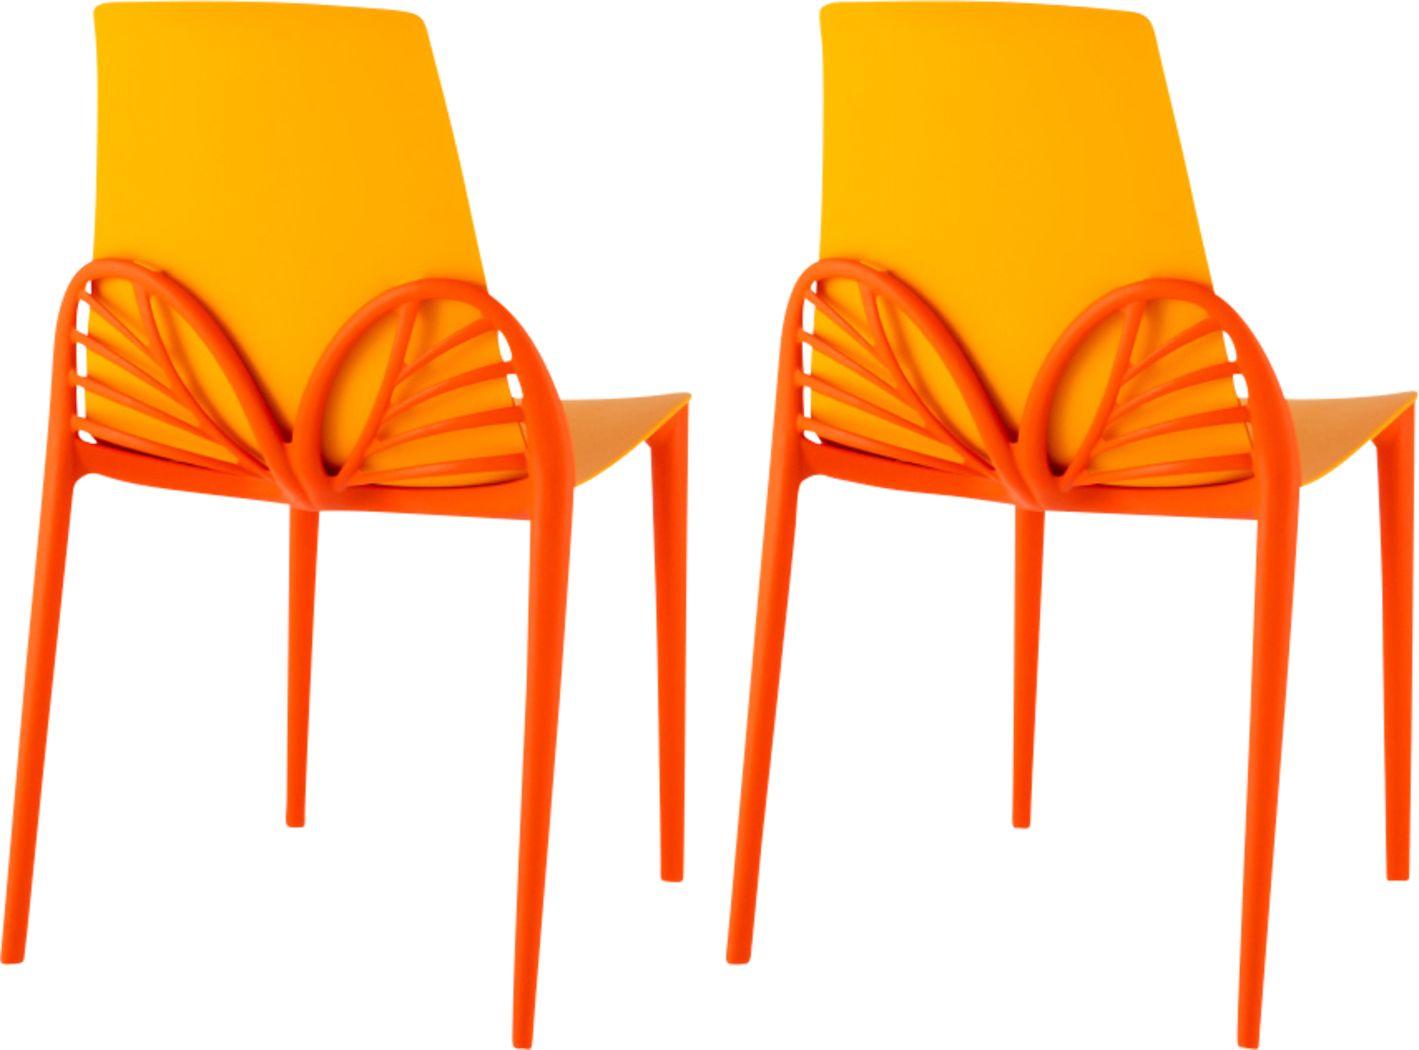 Lagoon Papillon Gold Outdoor Dinning Chair, Set of 2